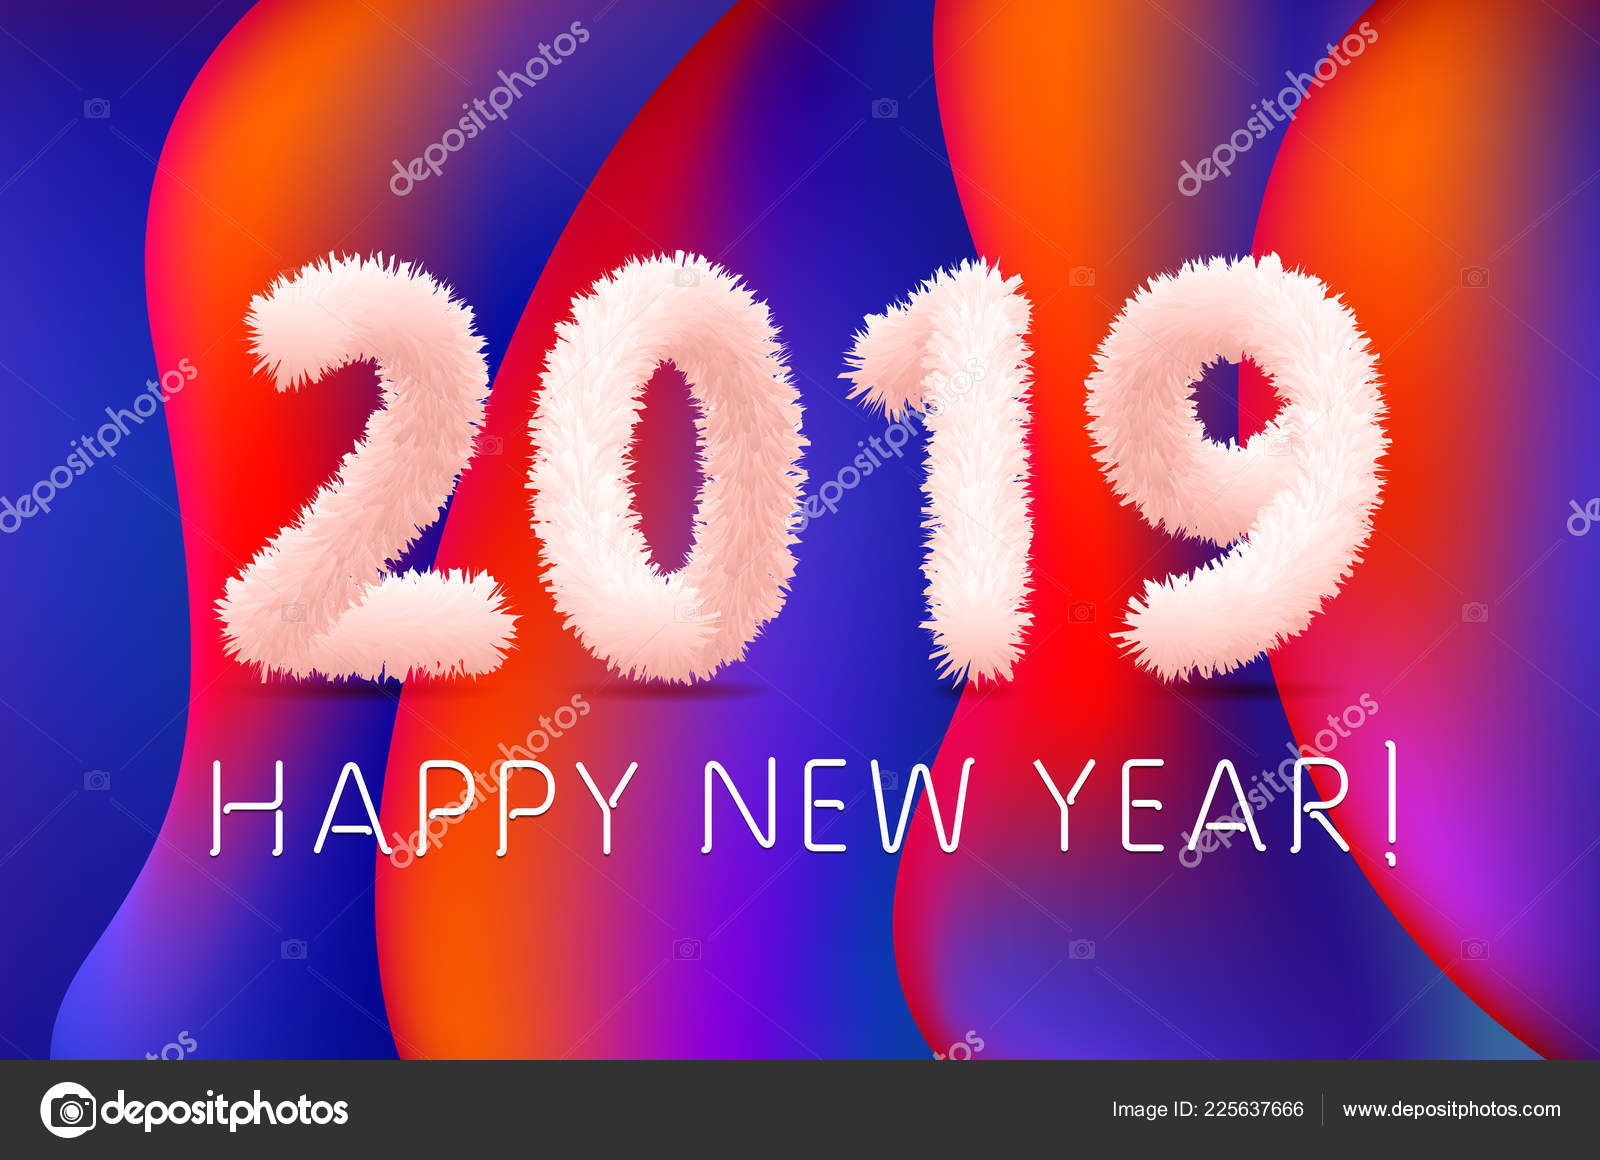 Carta Da Parati Pelosa Rosa : Lana shaggy pelosa rosa wooly felice anno nuovo sfondo